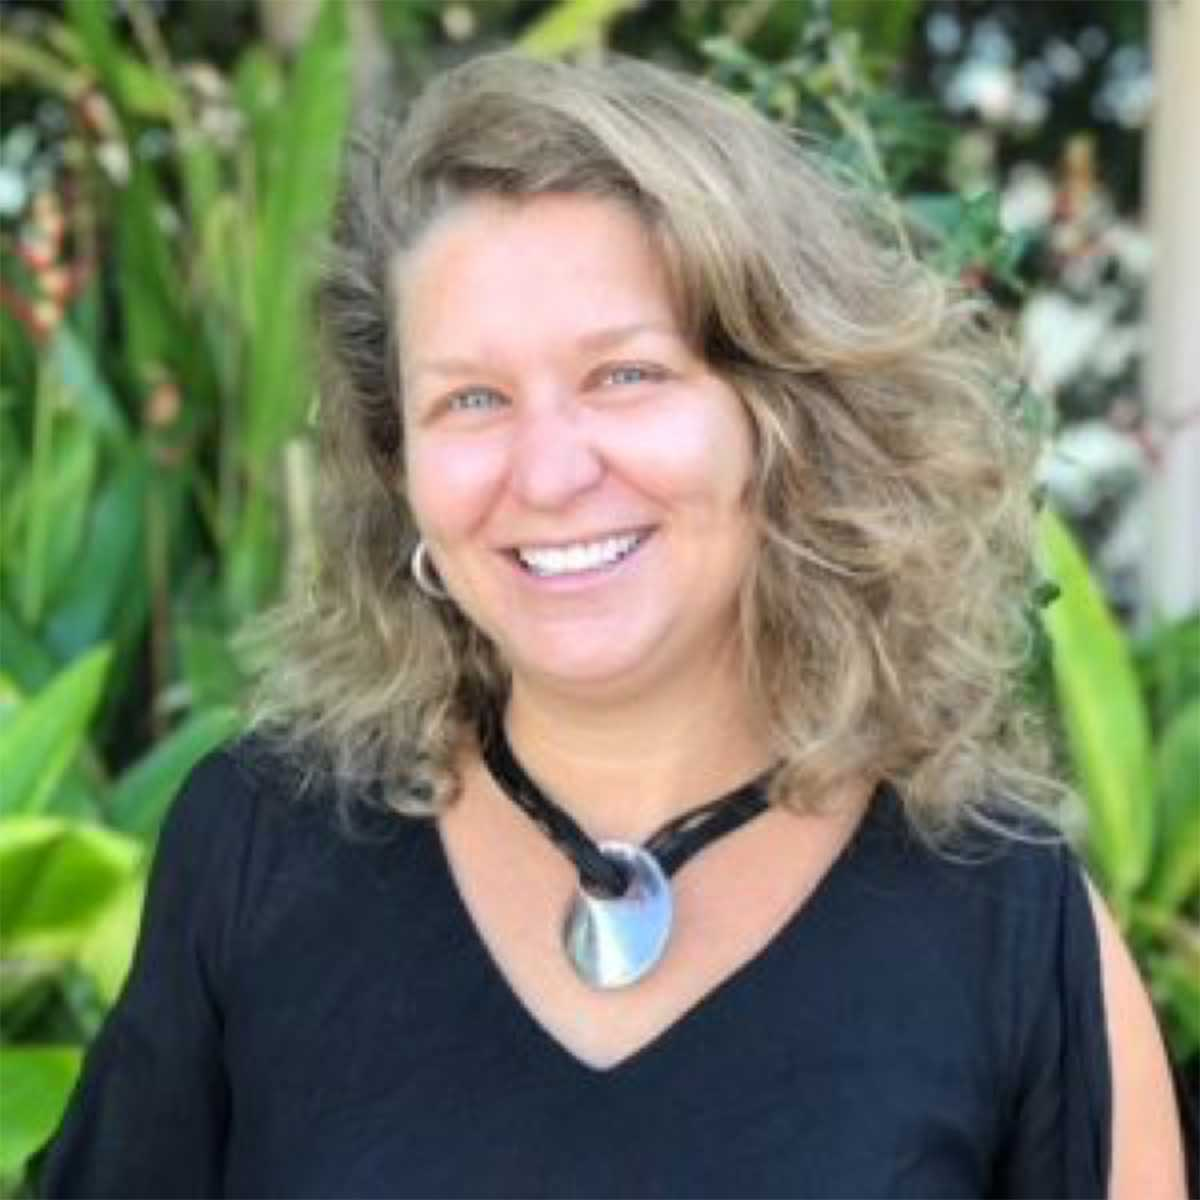 Priscilla Souto, LMHC - Center for Trauma Counseling